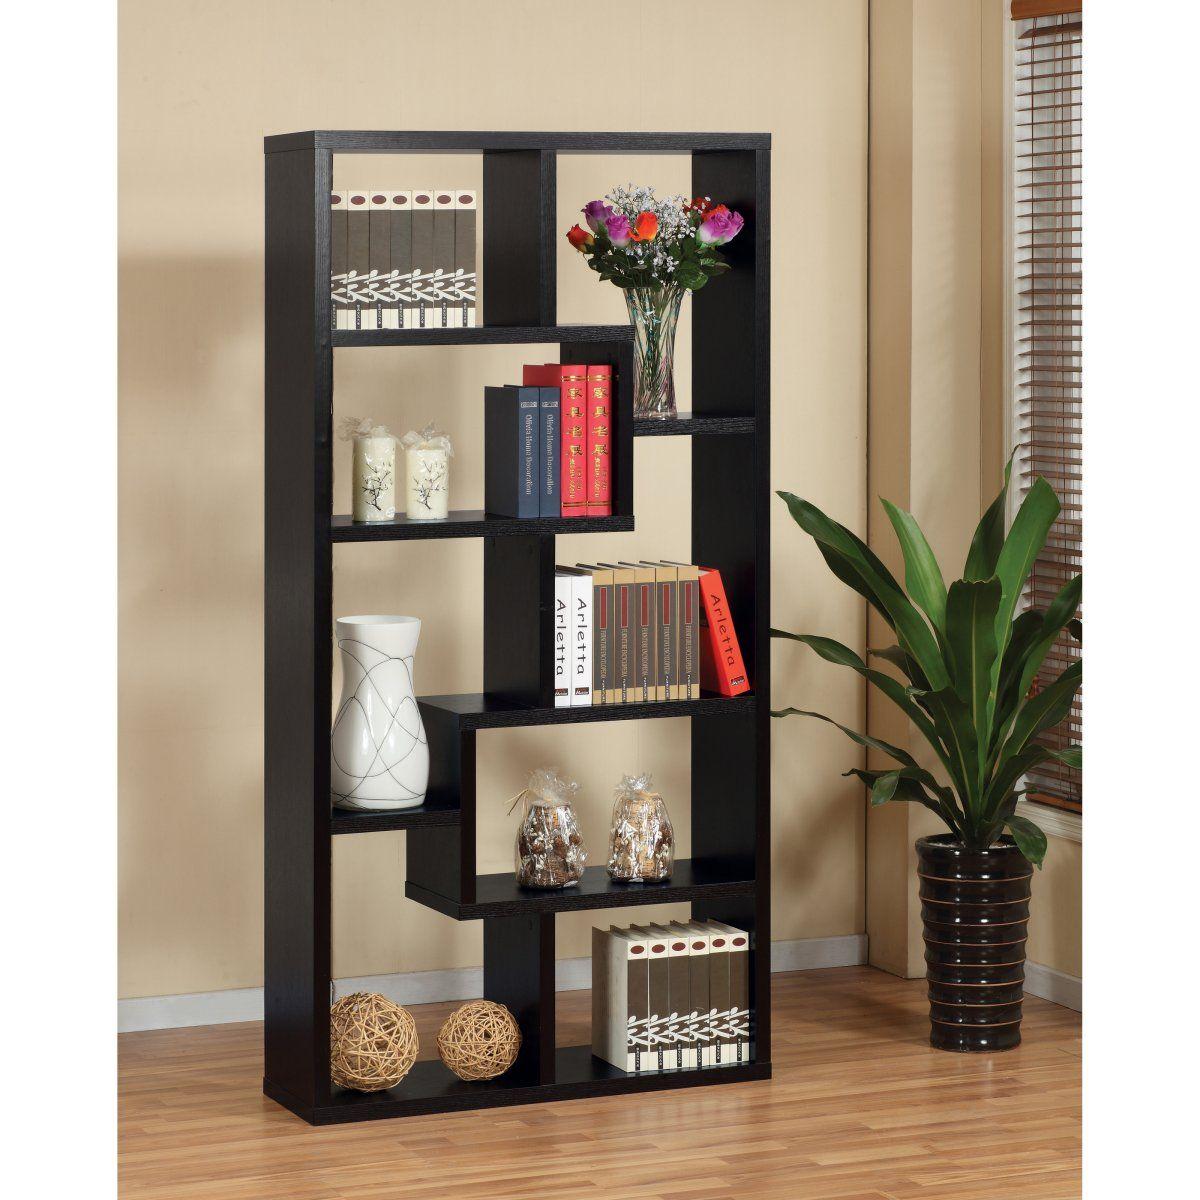 Enitial Lab Verena Contoured Leveled Display Cabinet/ Bookcase - Black